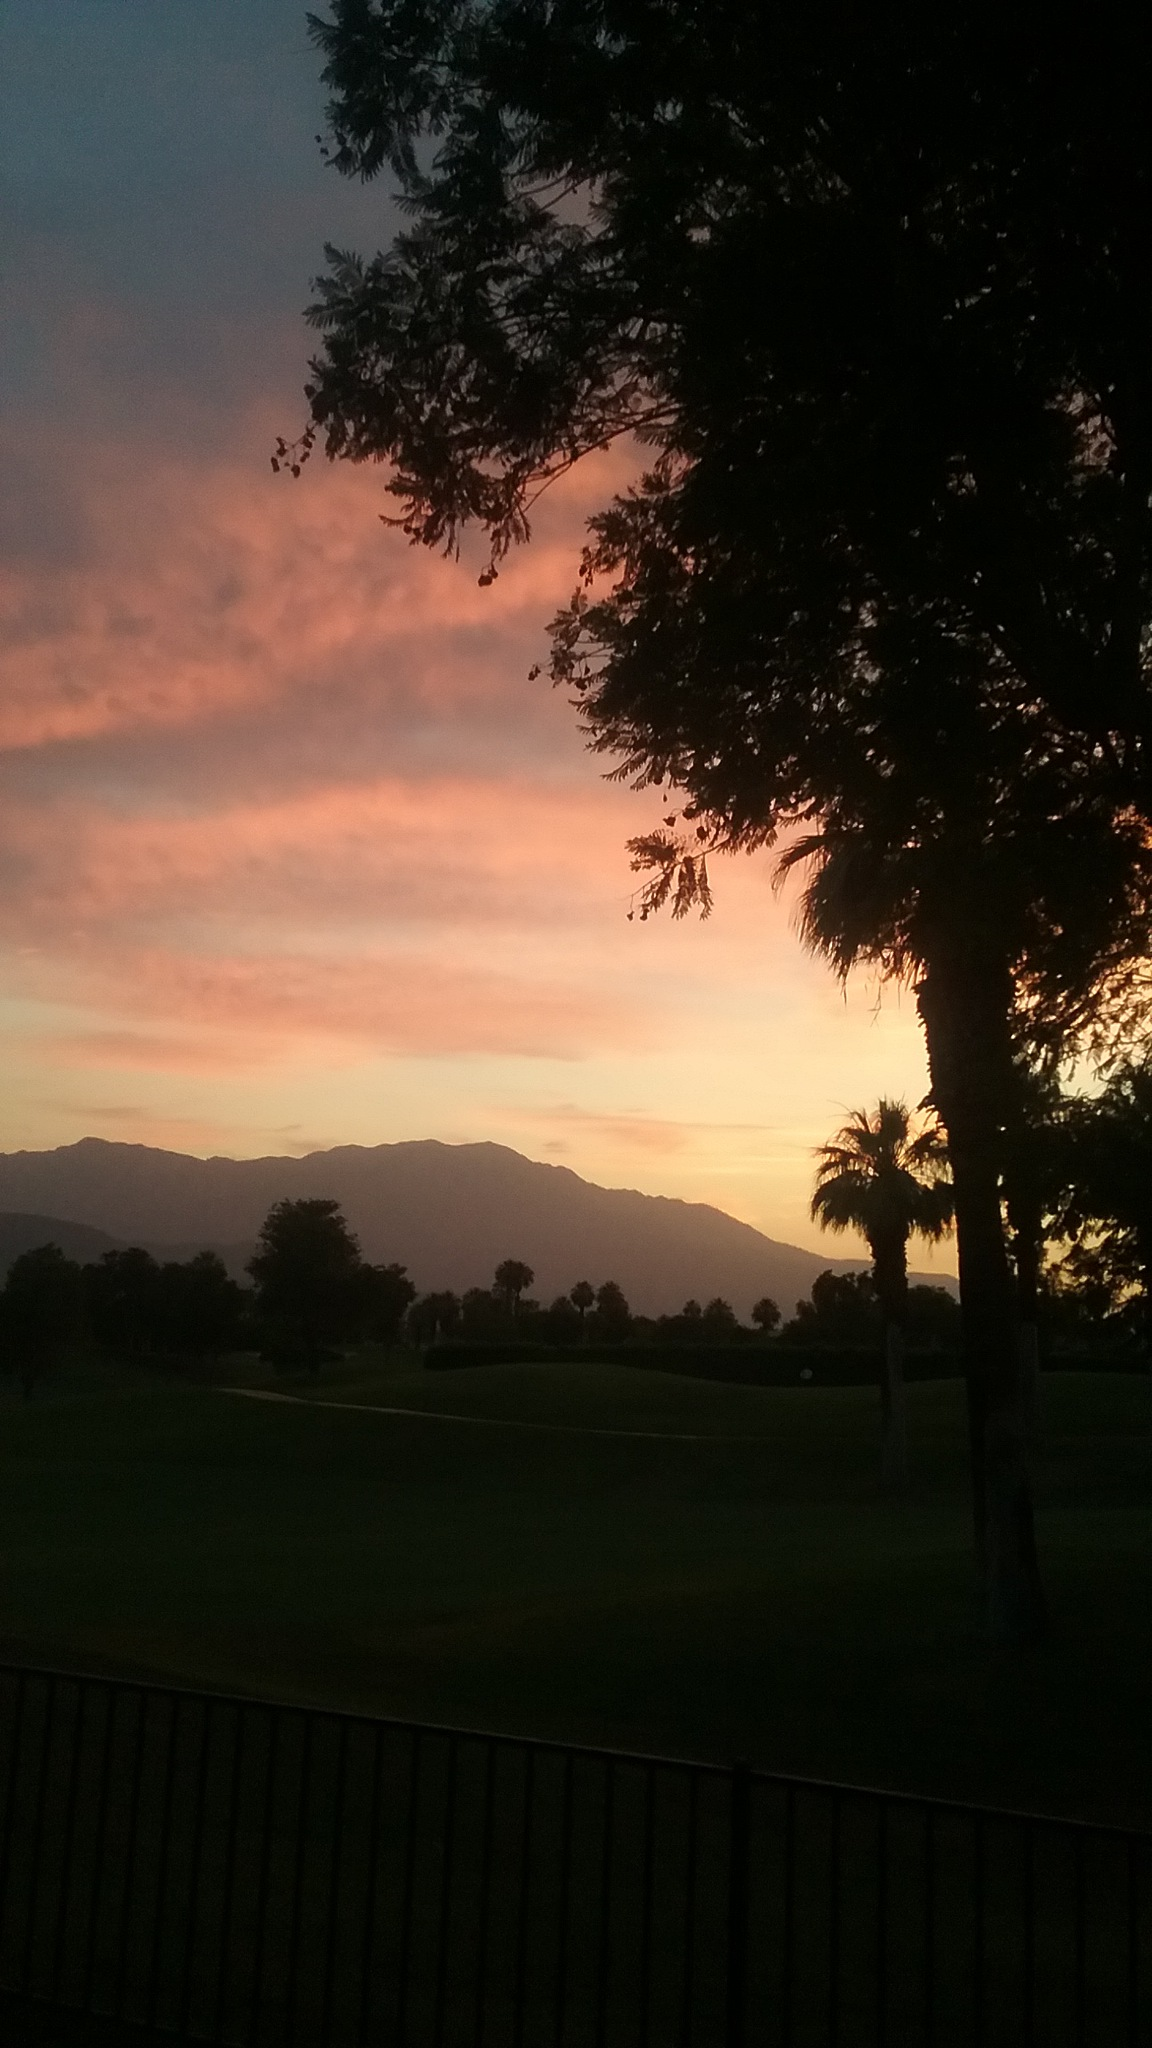 Fire Enhanced Desert Sunset  by T.Neil Walker